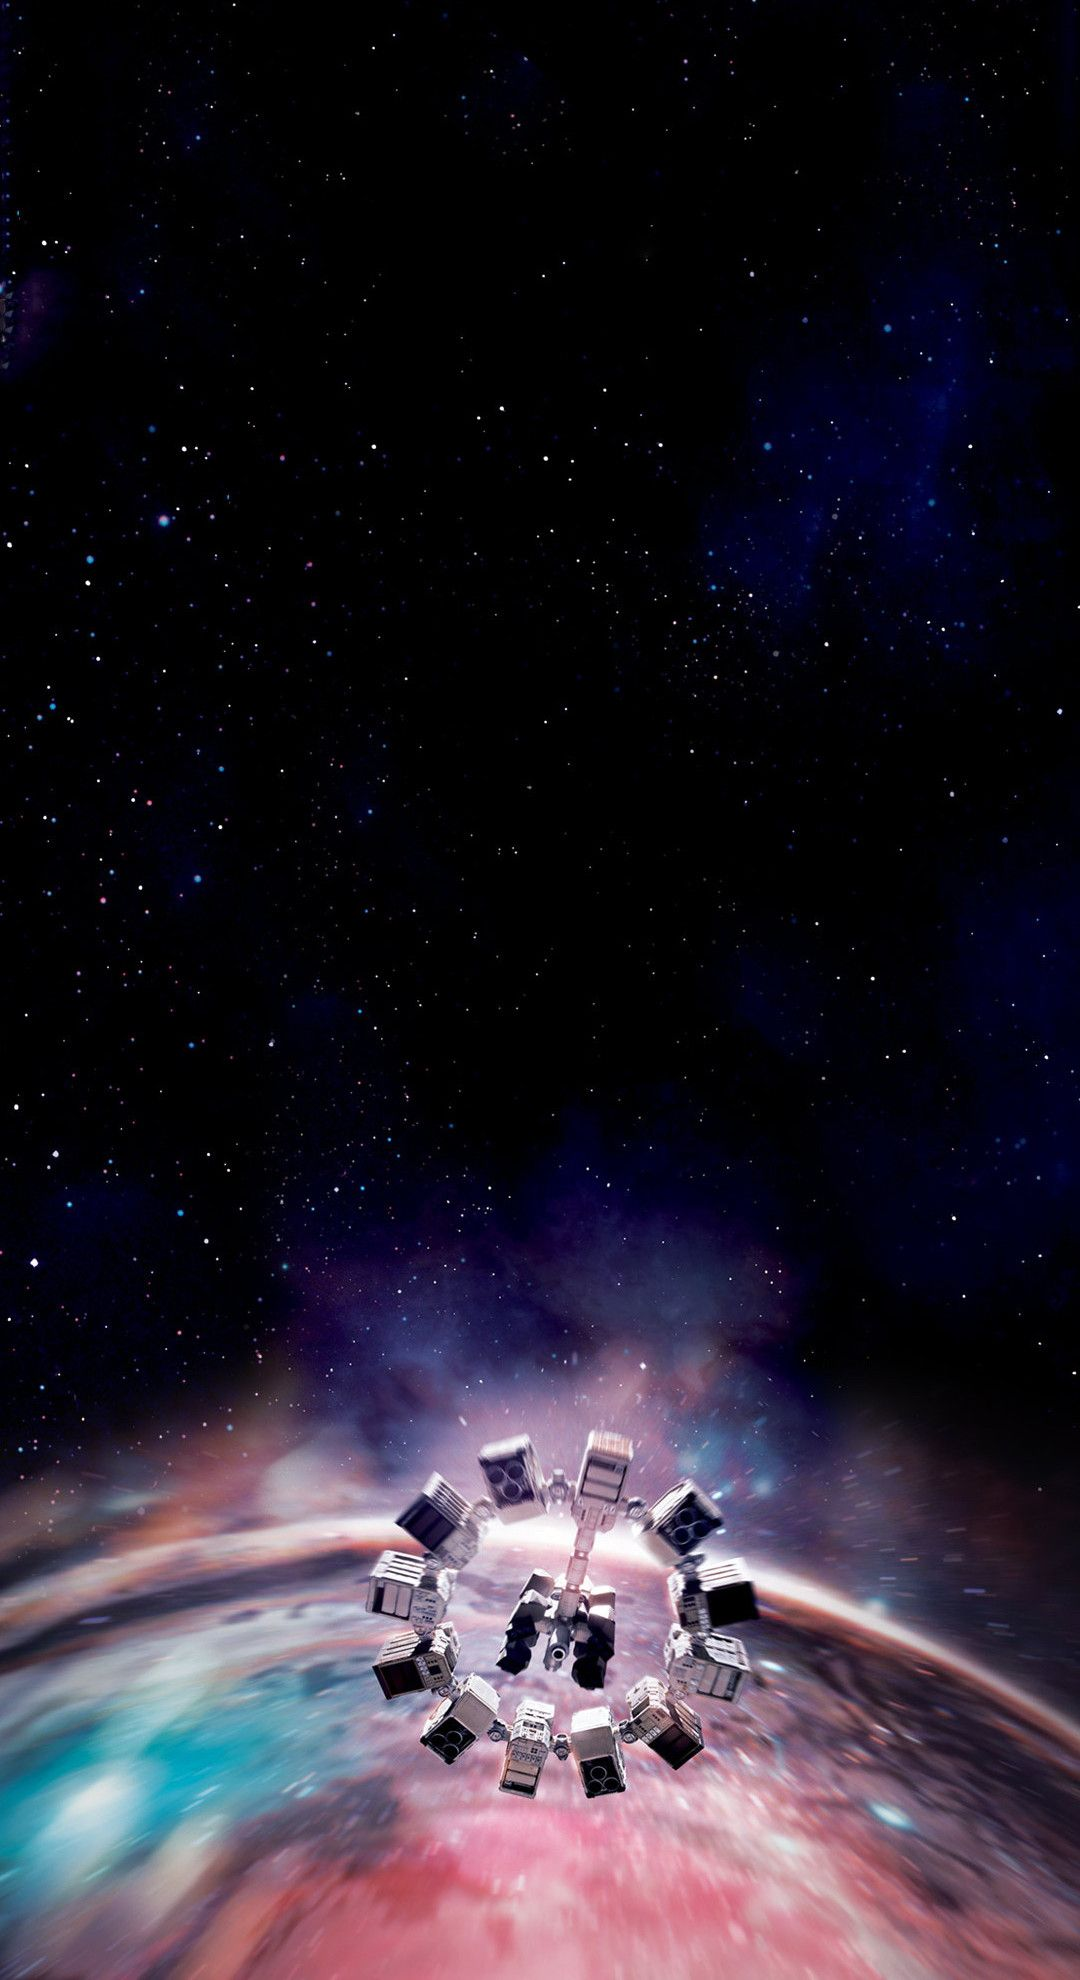 Endurance Wormhole Espaco E Astronomia Interestelar Interestelar Filme